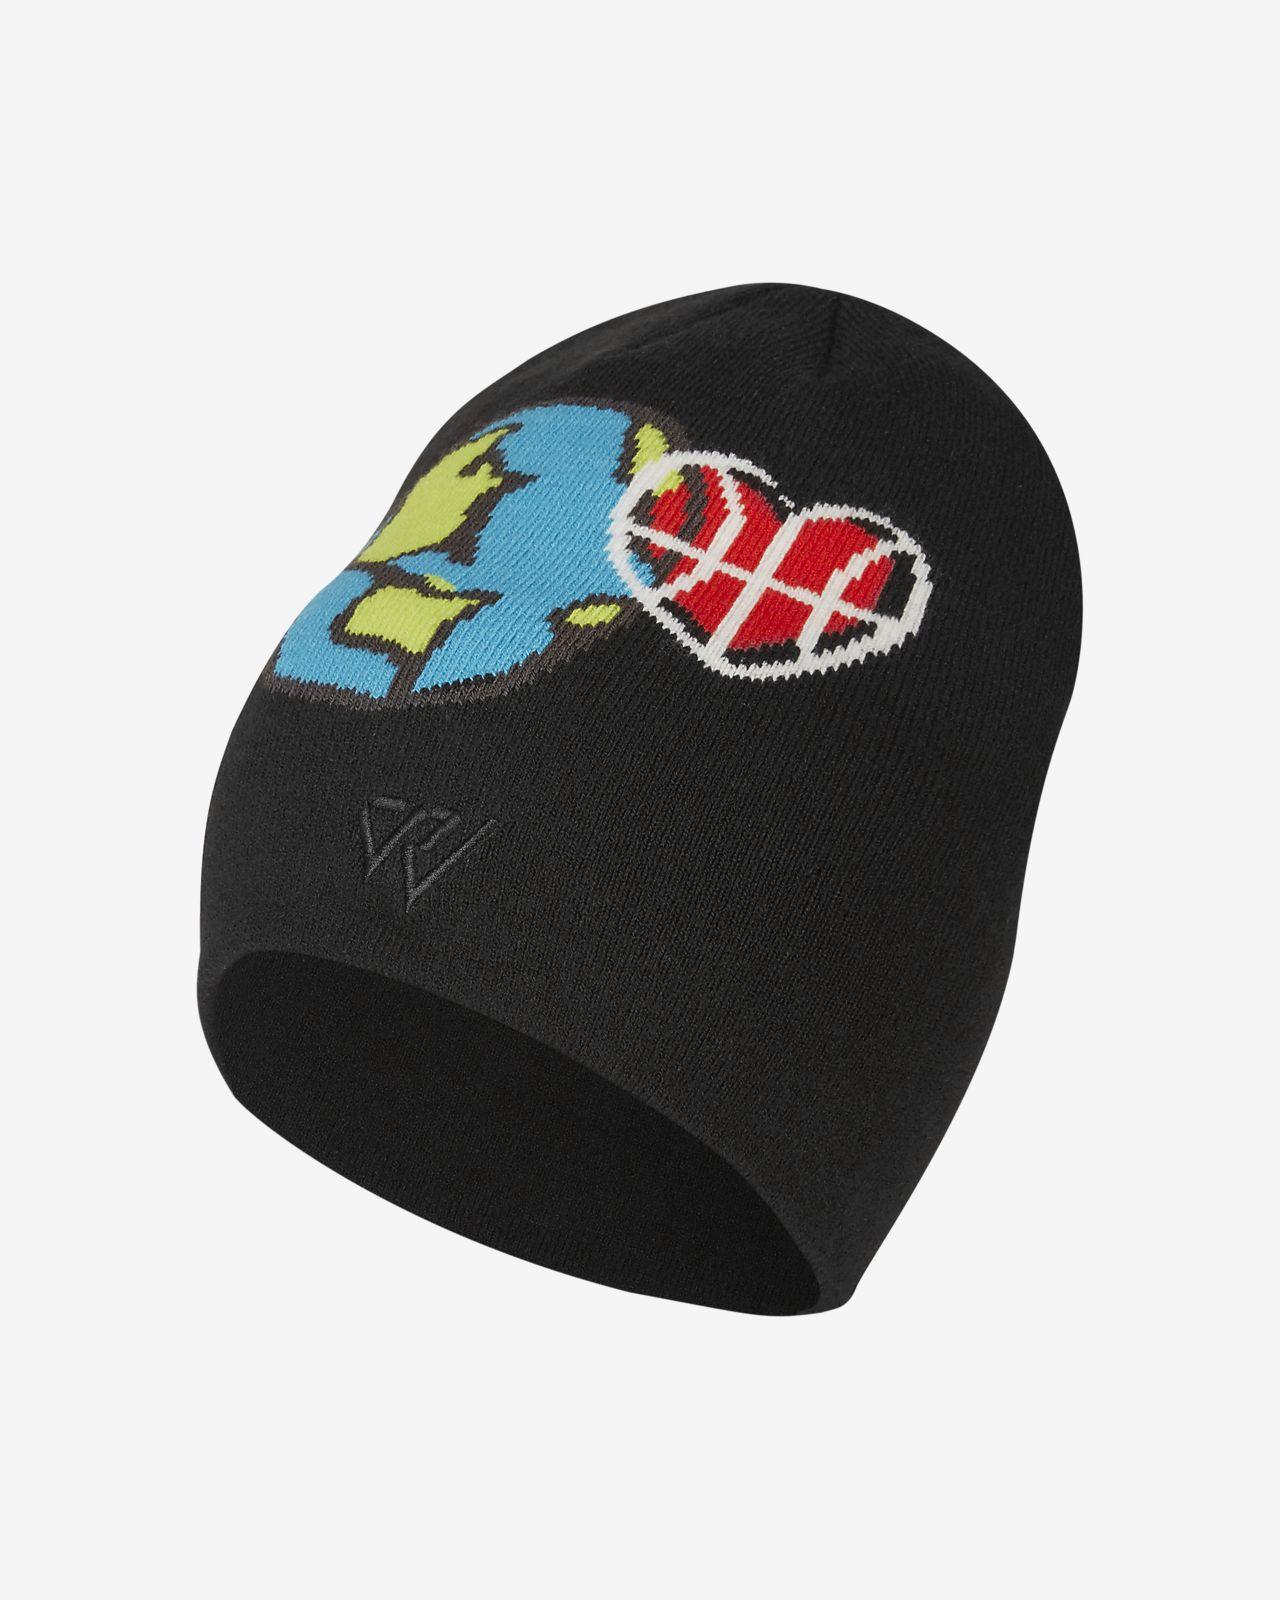 Jordan x Russell Westbrook 针织帽